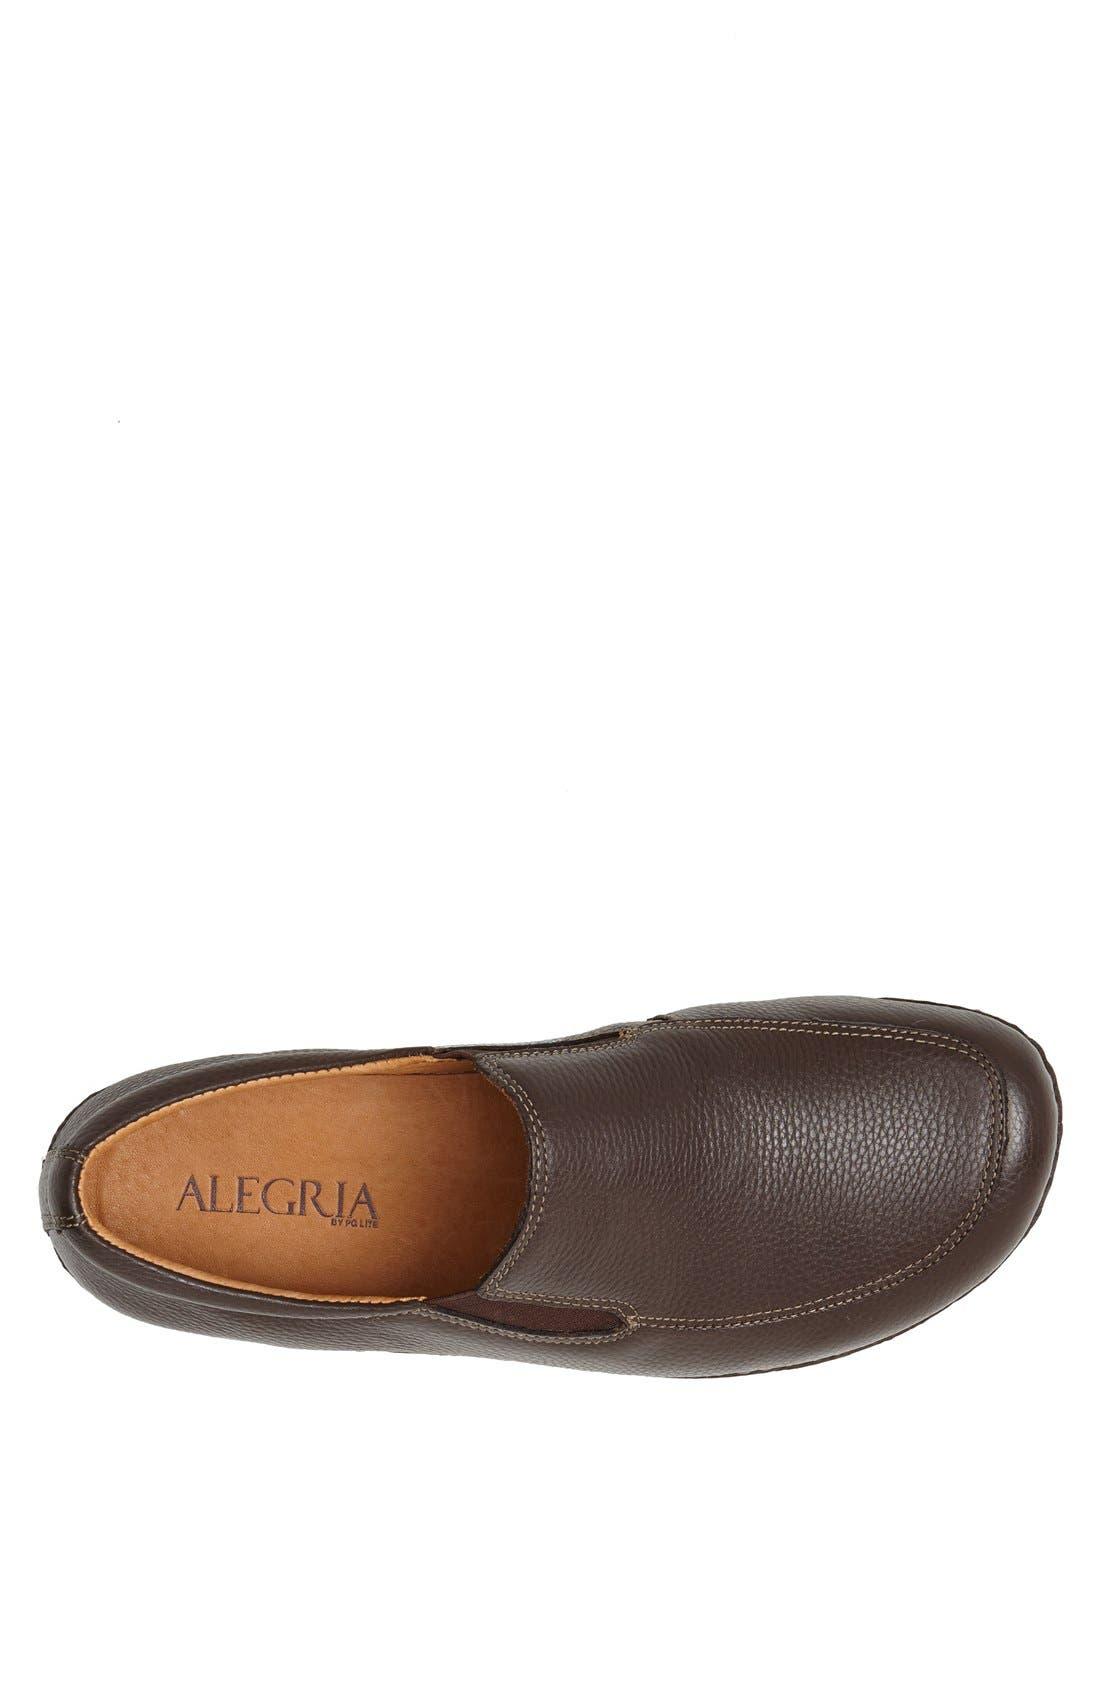 Alternate Image 3  - Alegria 'Foxe' Venetian Loafer (Men)